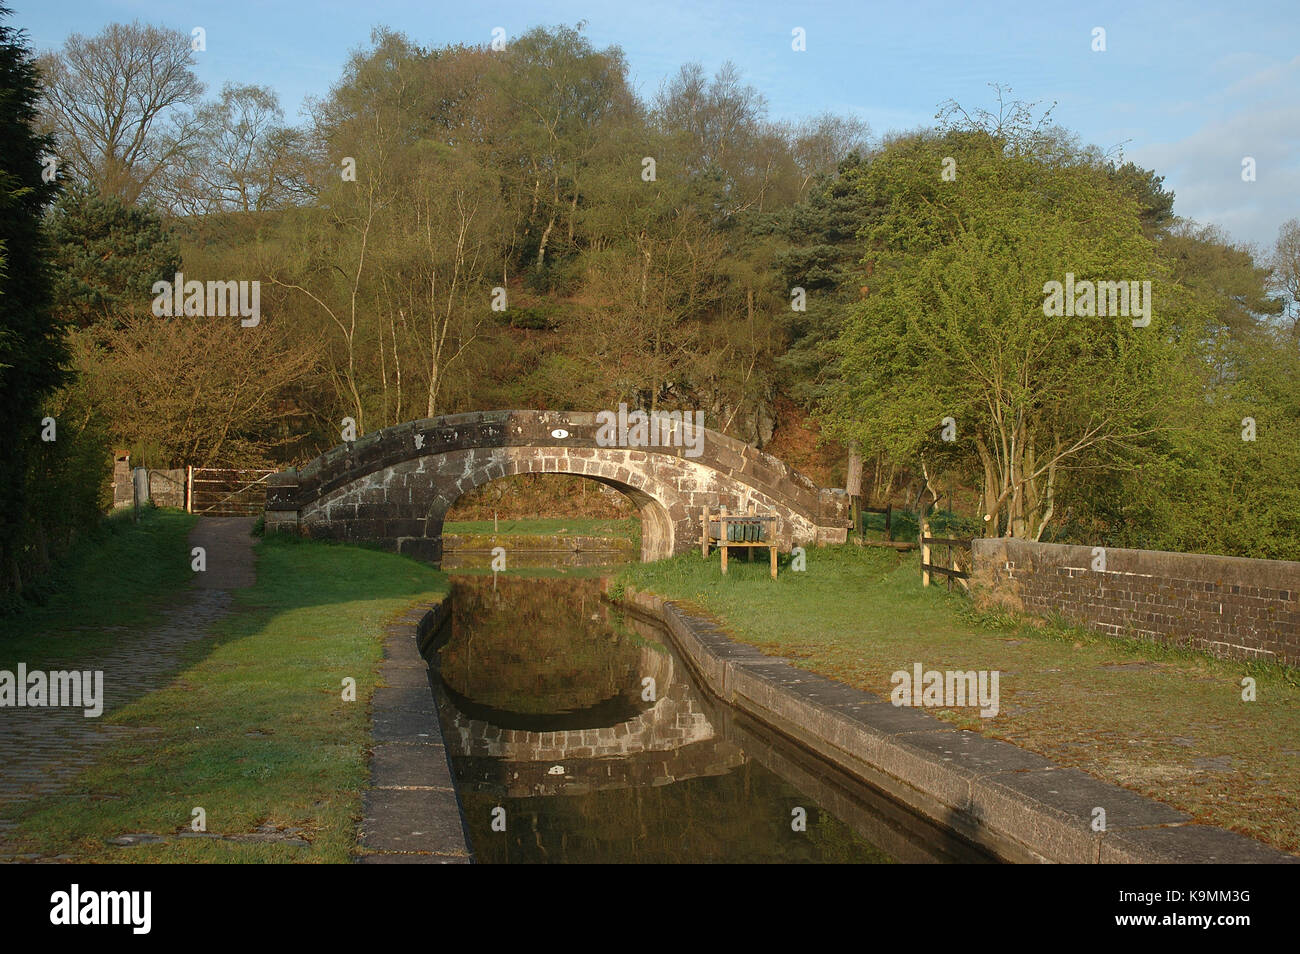 Hanley staffordshire united kingdom